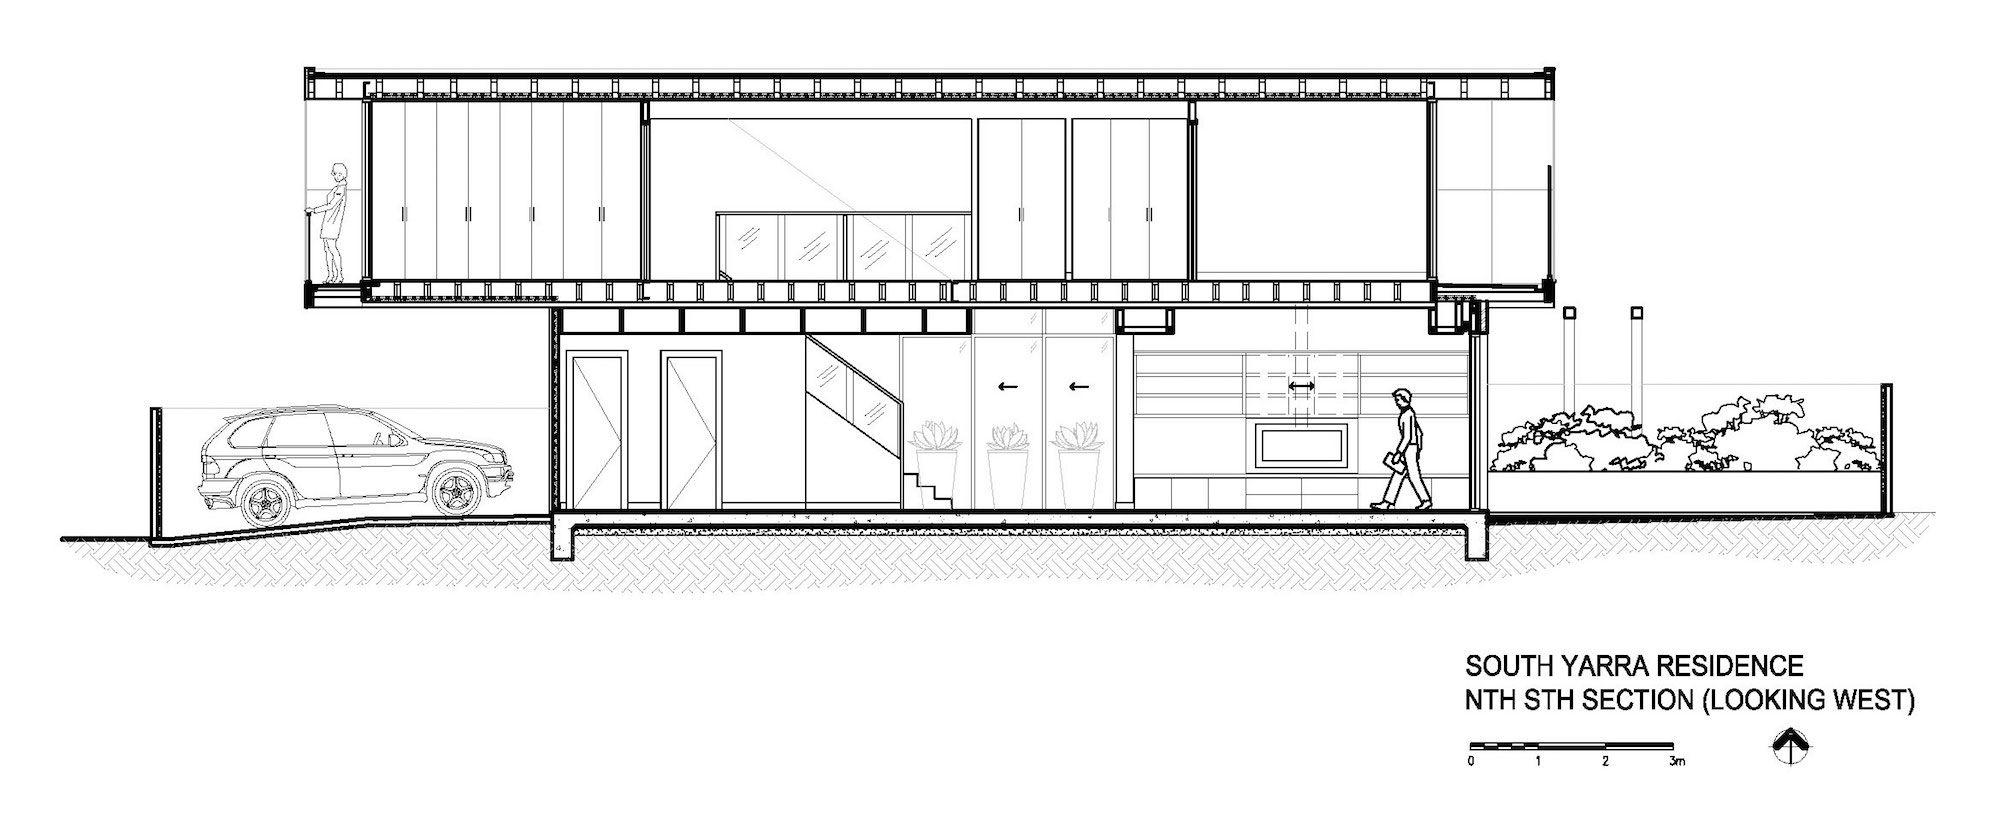 South-Yarra-Residence-14